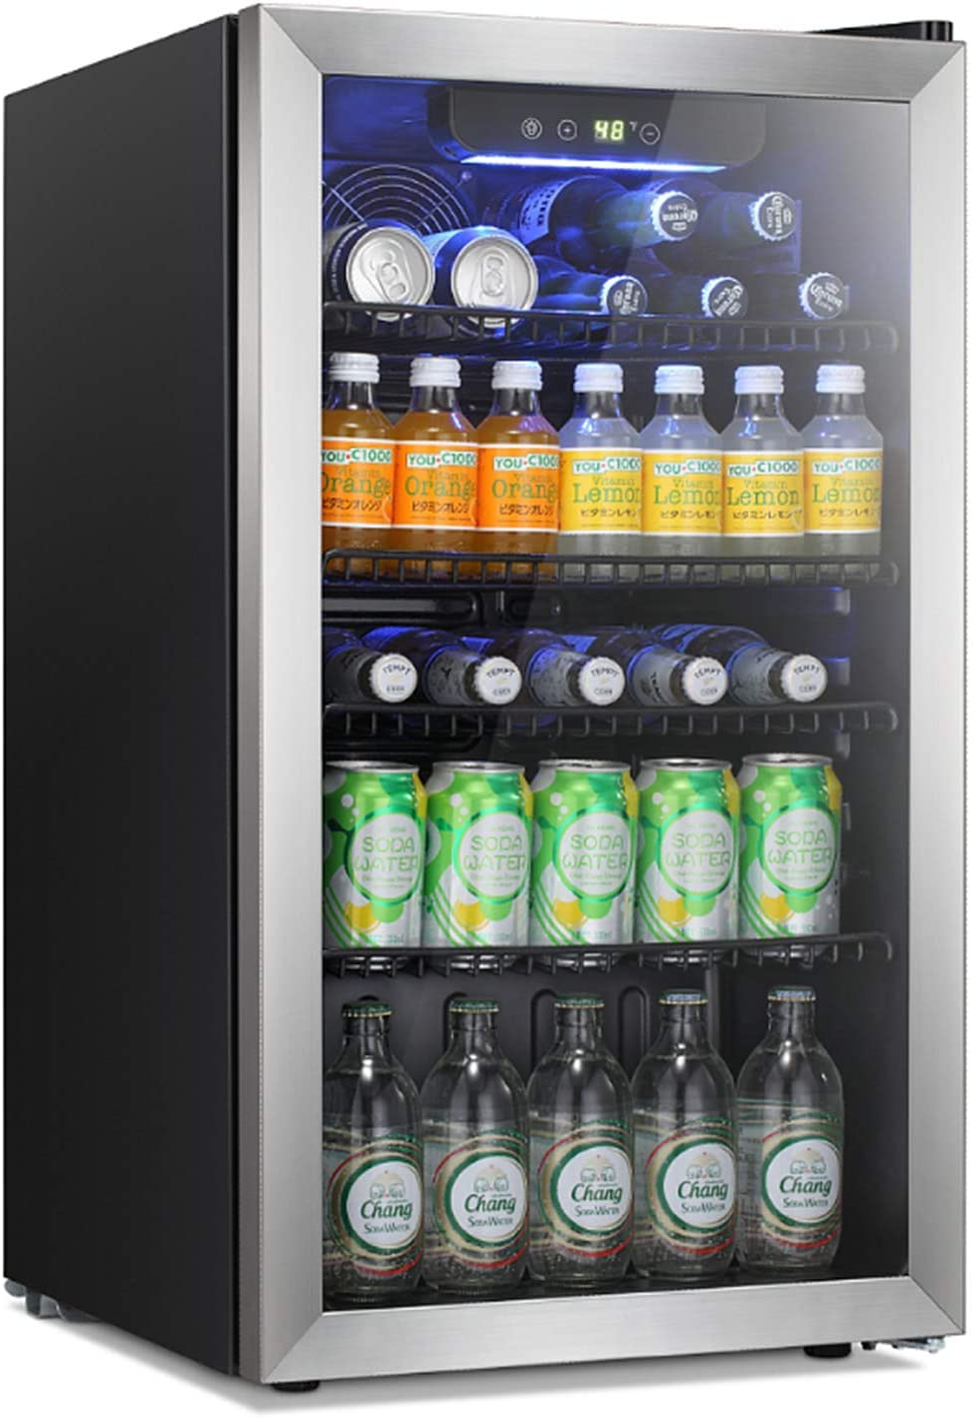 Antarctic Star Beverage Refrigerator Cooler -120 Can Mini Fridge Glass Door for Soda Beer or Wine Constant Glass Door Small Drink Dispenser Clear Front Door for Home, Bar 3.2cu.ft (Stainless Steel Silver)